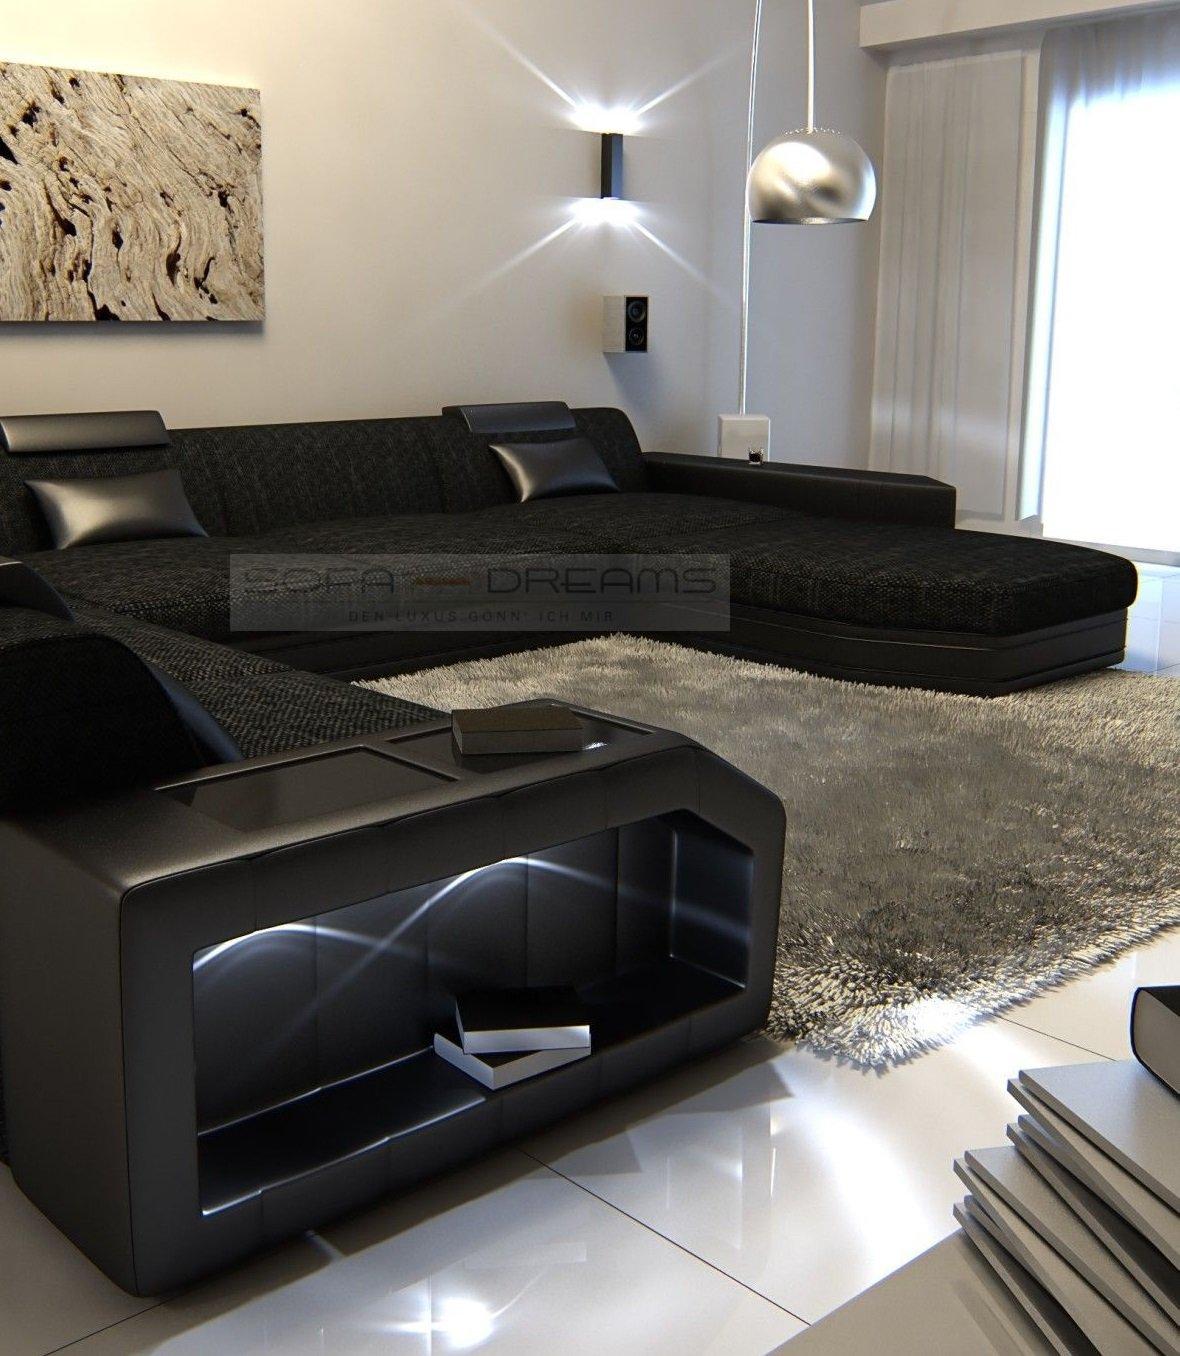 Amazon.com: Modern Fabric Sofa PRATO XXL with LED Lights ...